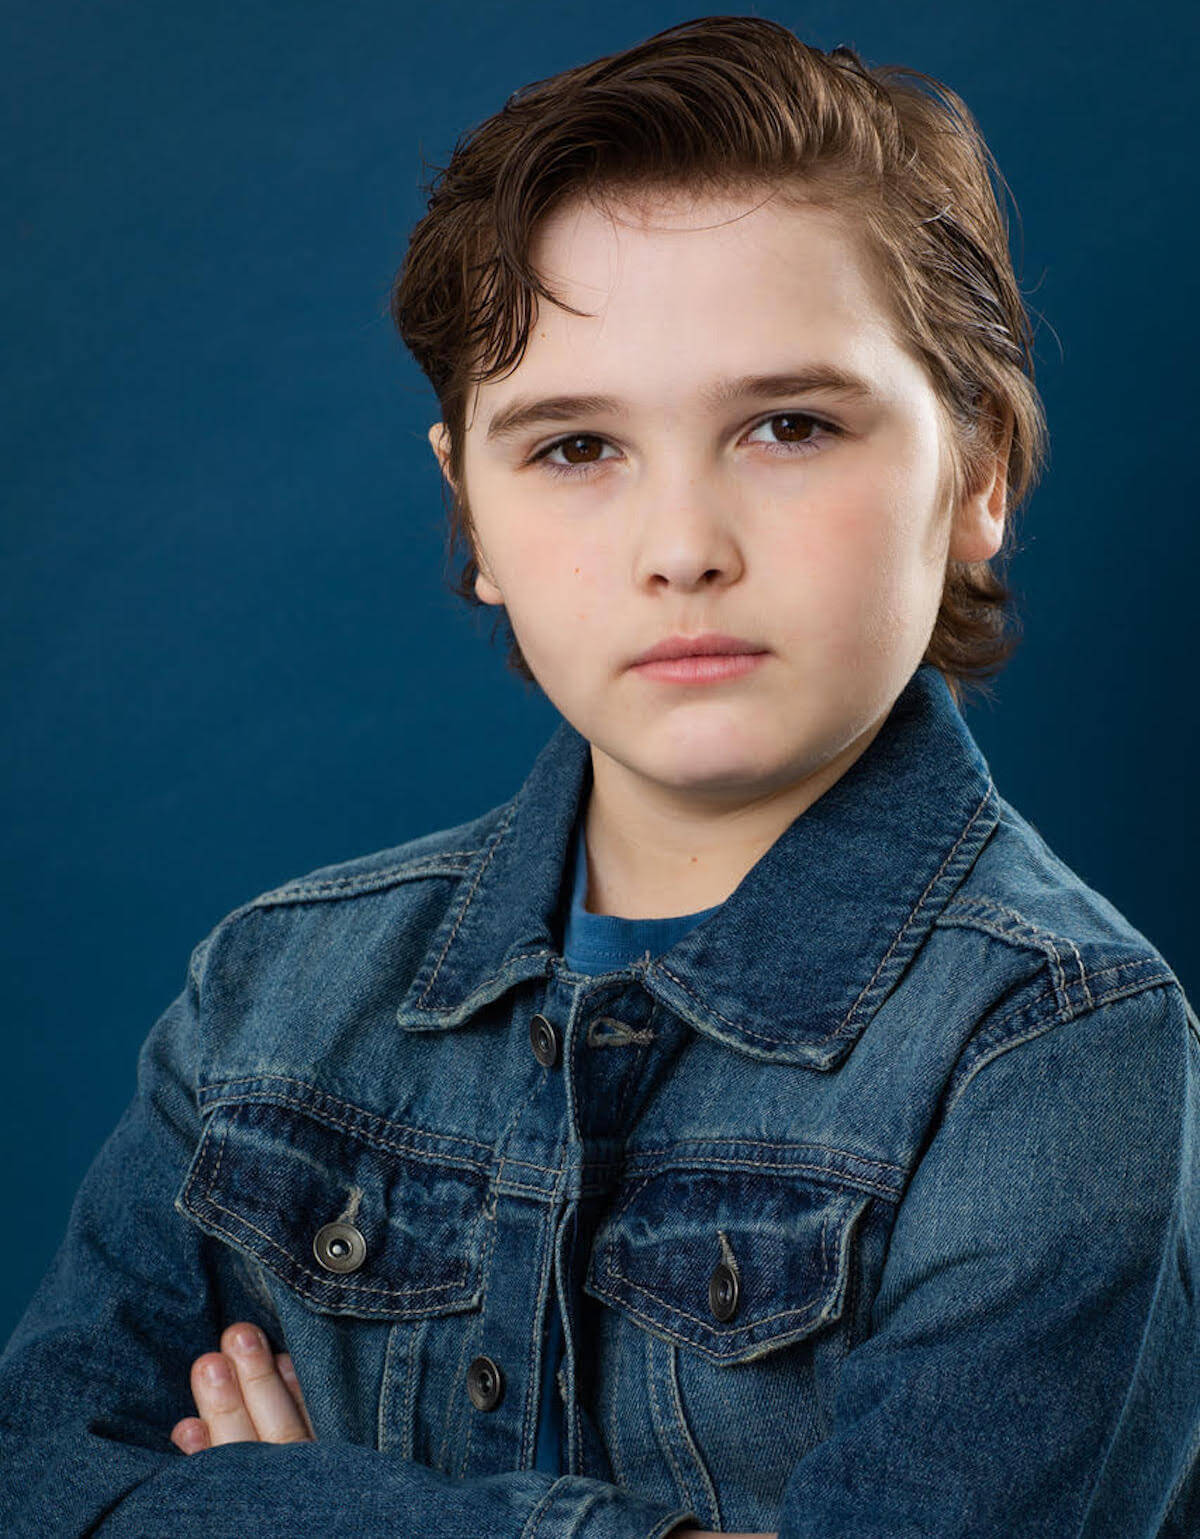 Cooper Friedman denim jacket headshot